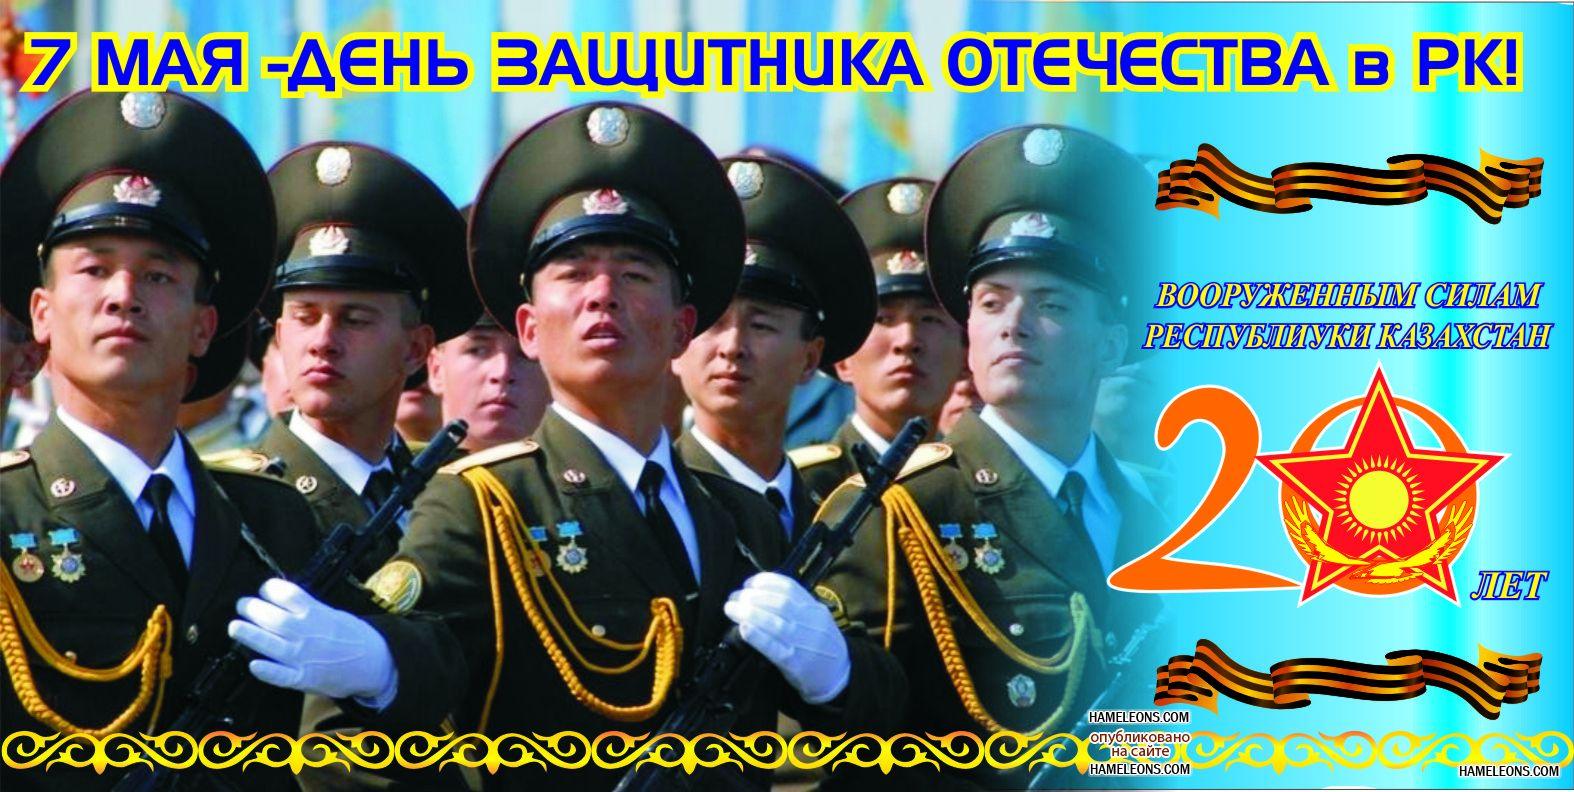 открытки с днем защитника отечества в казахстане 7 мая любовная